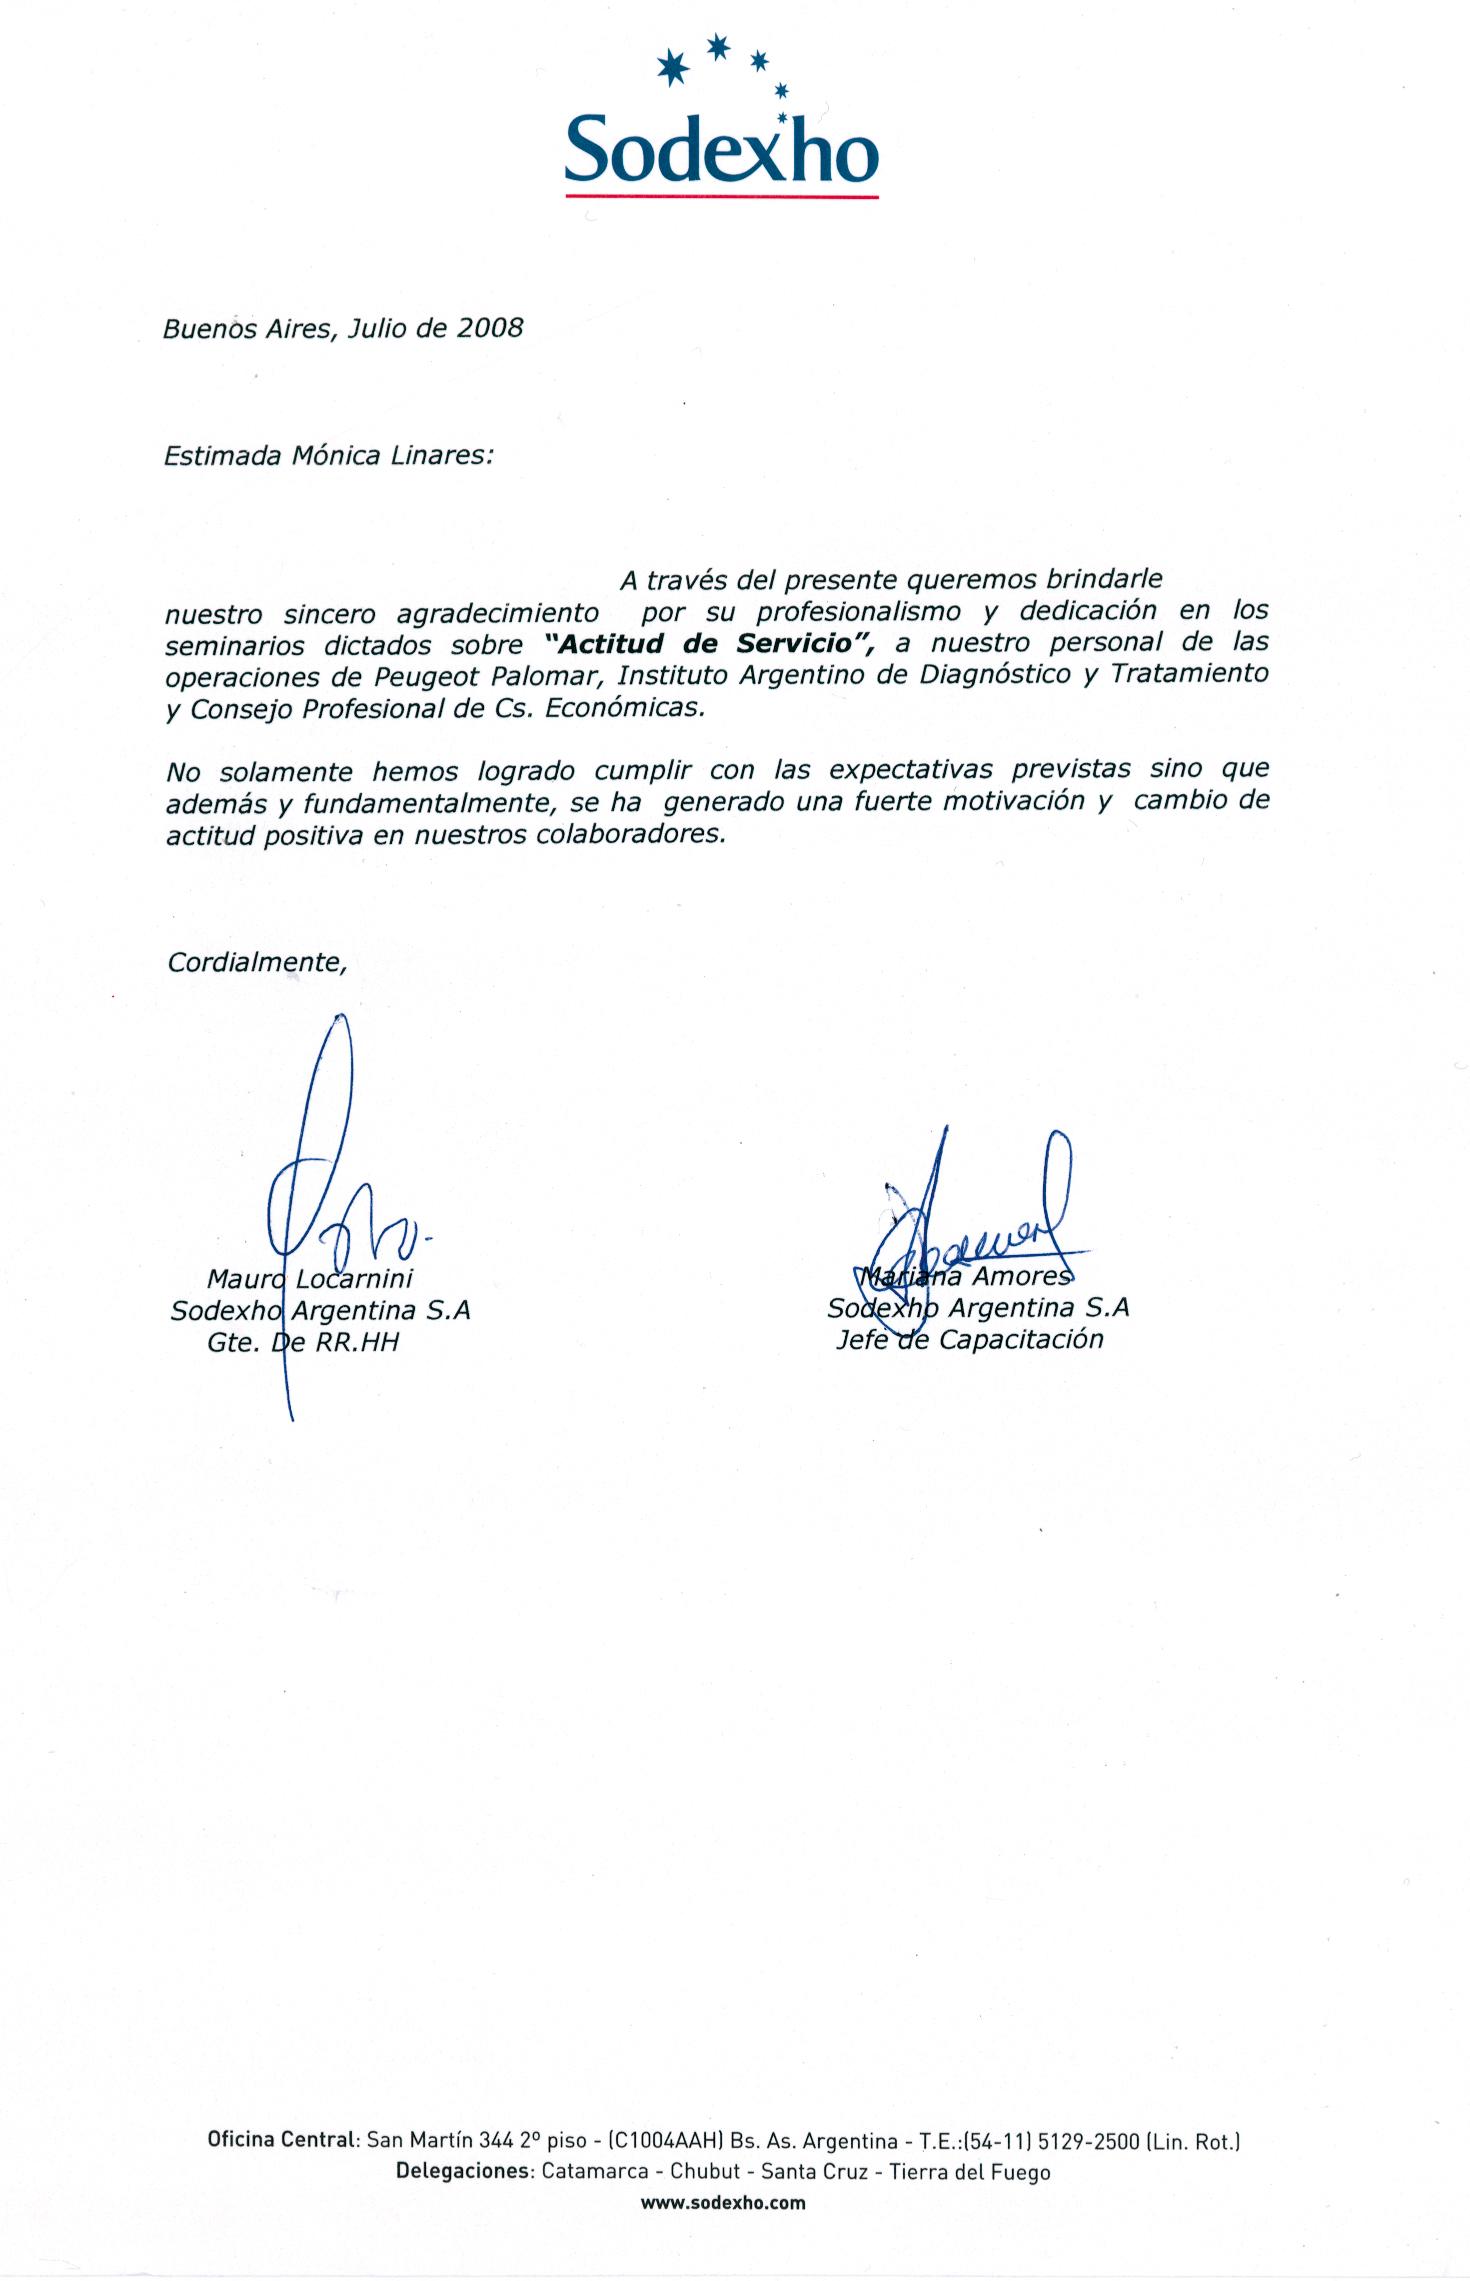 17_REFERENCIA_SODEXO_ARGENTINA